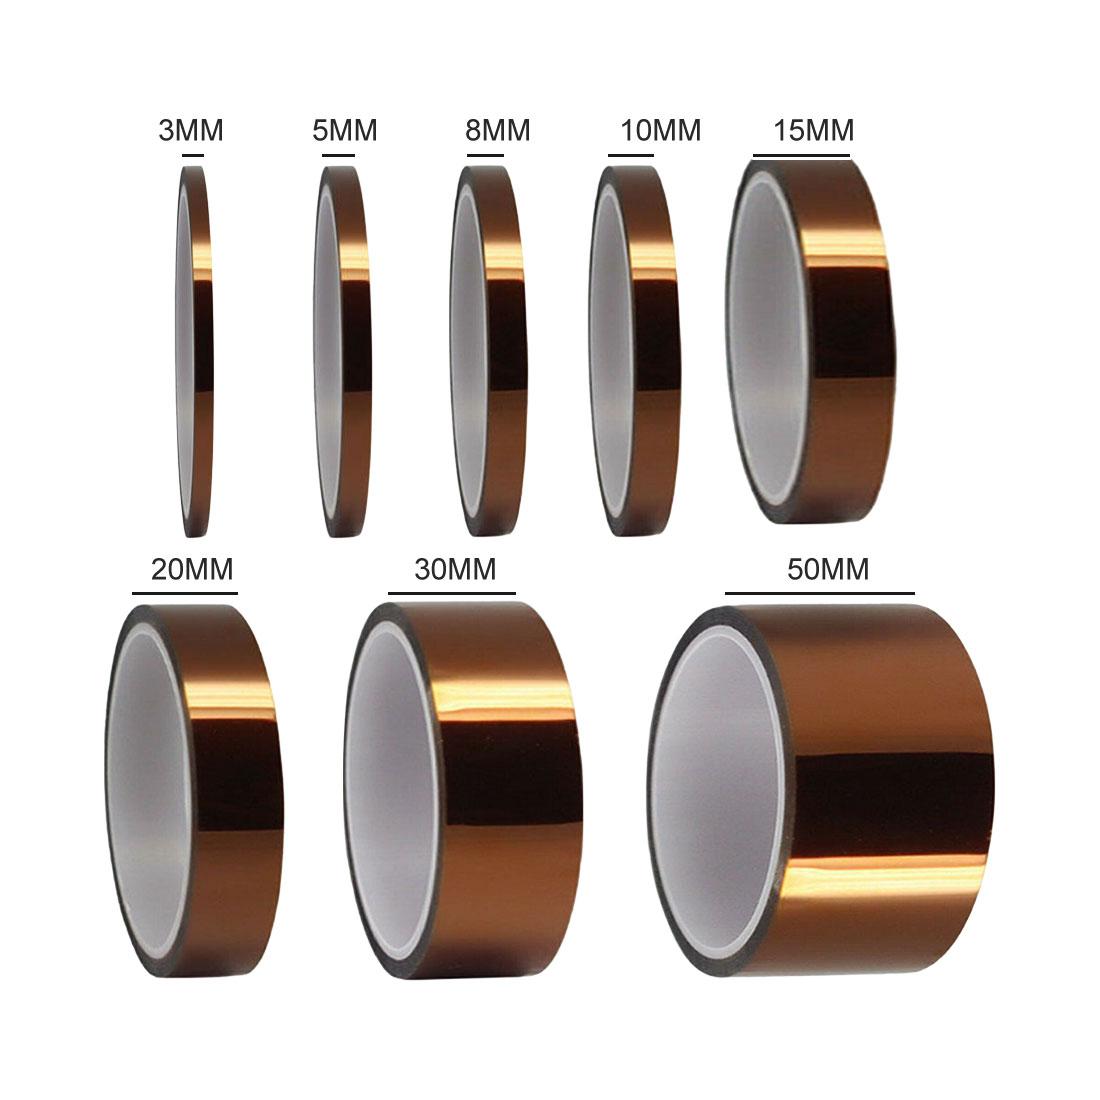 Cinta de calor de alta temperatura de 33M, cinta de aislamiento térmico, cinta adhesiva aislante de poliimida, protección de Placa de impresión 3D